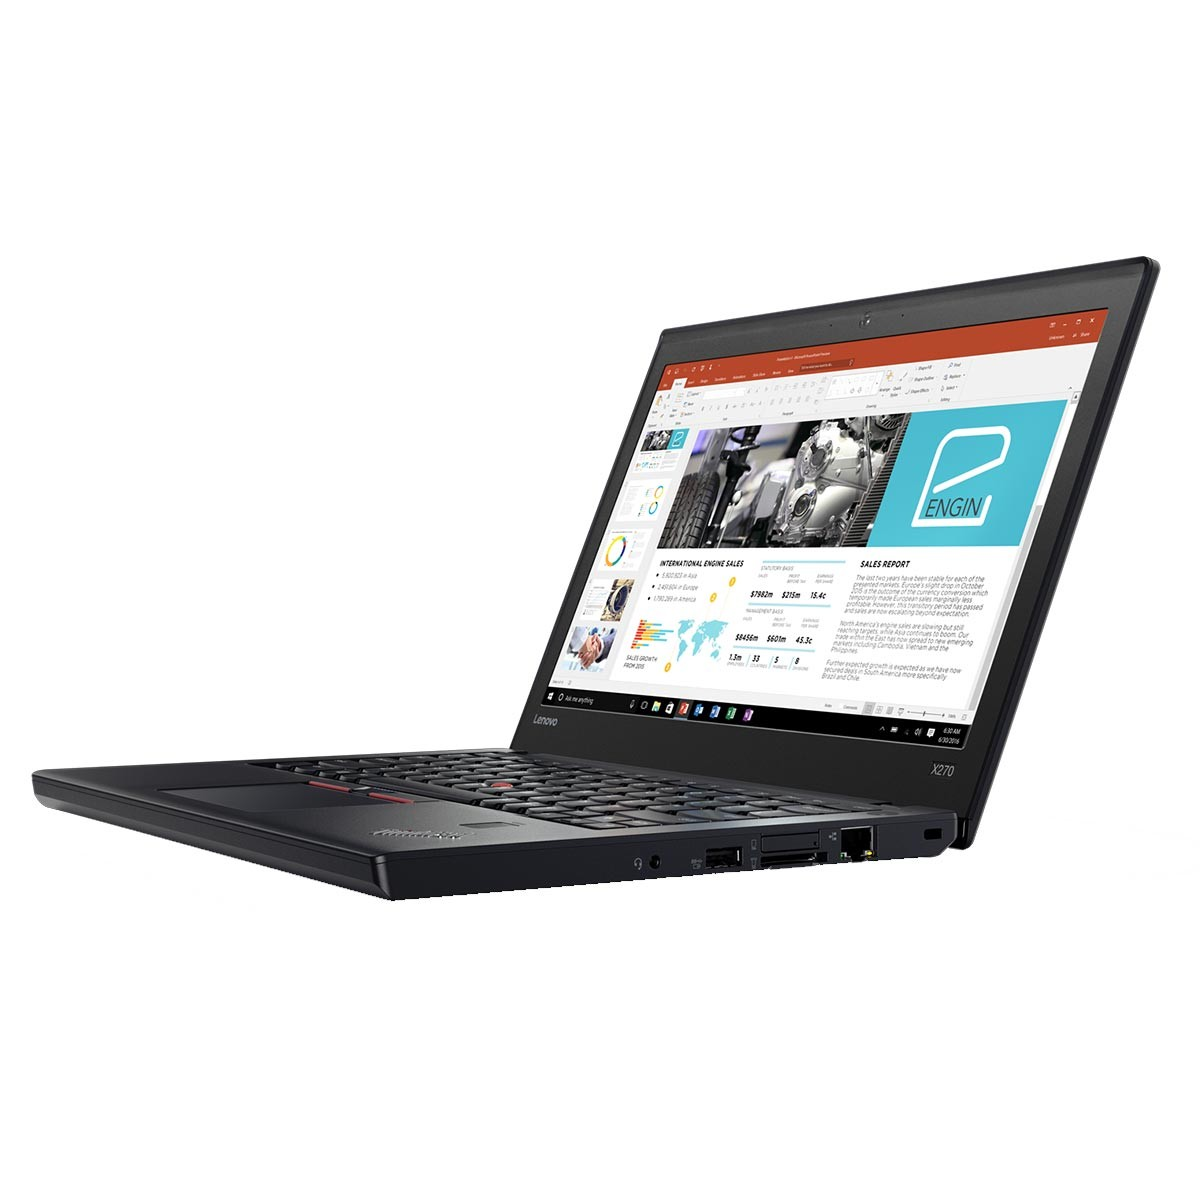 Lenovo™ ThinkPad® X270 Notebook-Konfigurator Modell 20HN-CTO